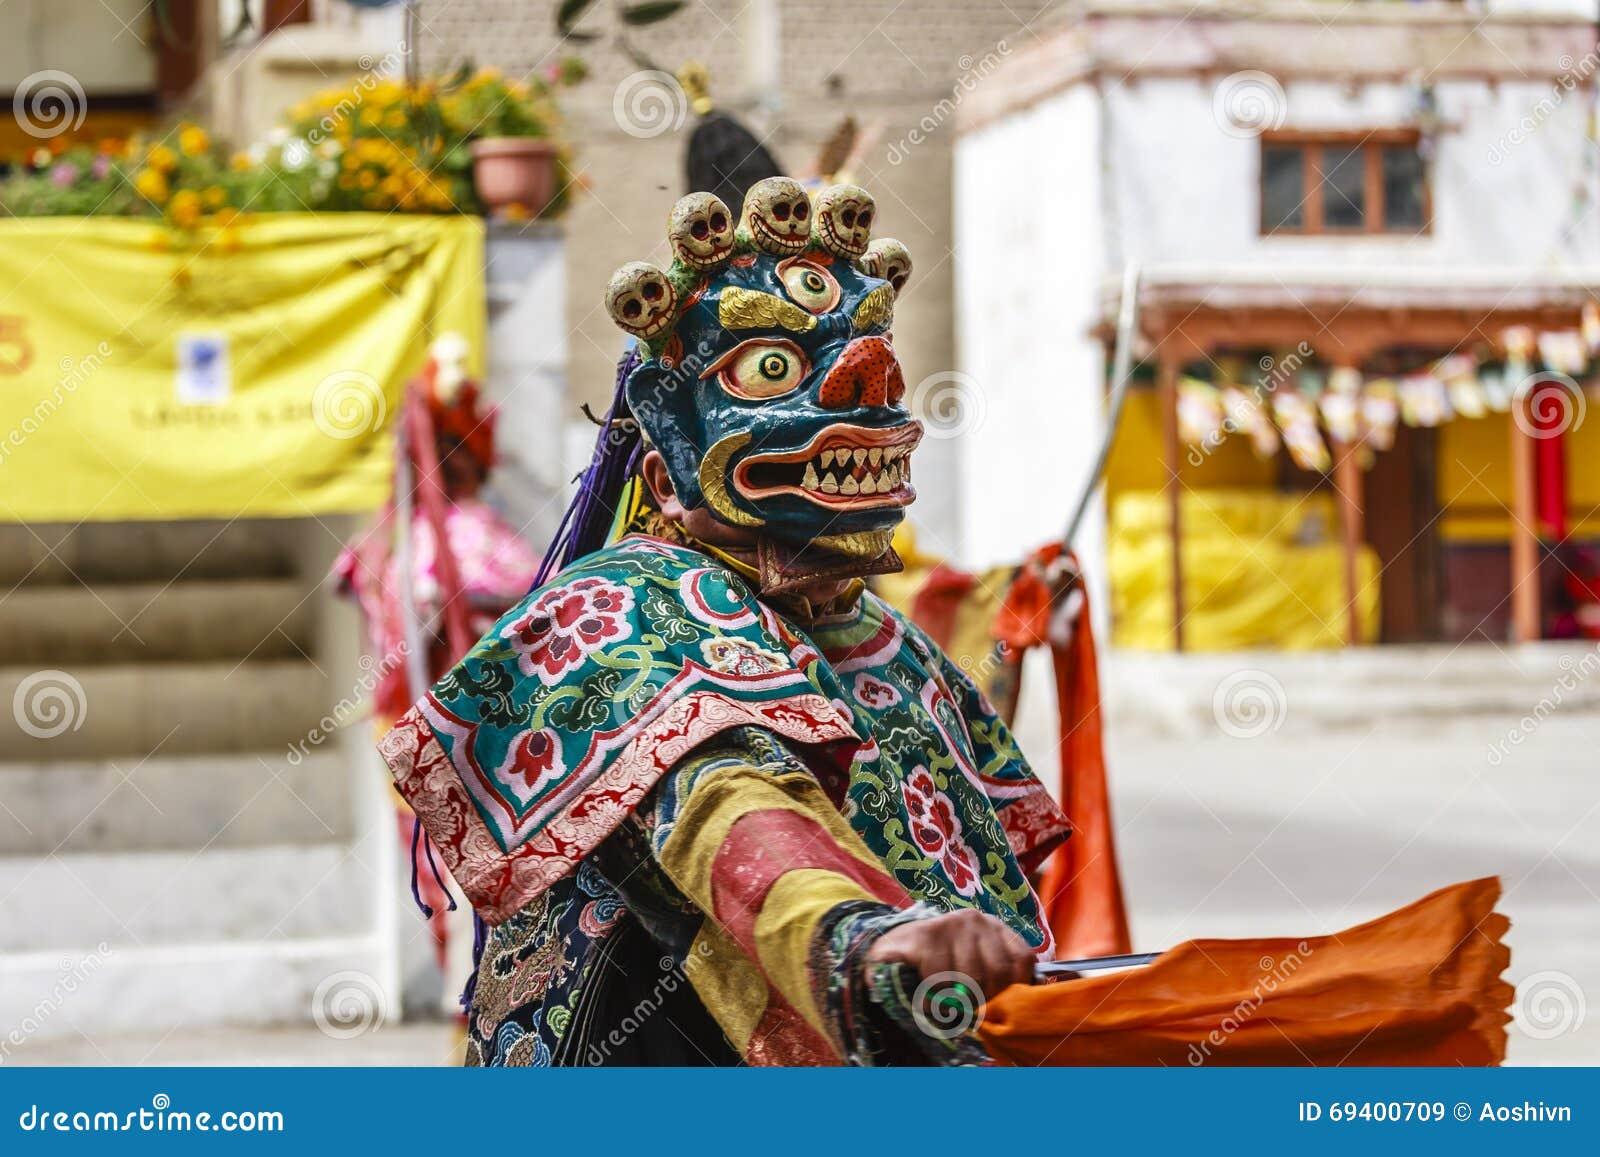 6327305e0 LAMAYURU, INDIA - SETEMBER 13, 2015: An unidentified buddhist lamas dressed  in mystical mask dancing Tsam mystery dance in time of Yuru Kabgyat Buddhist  ...